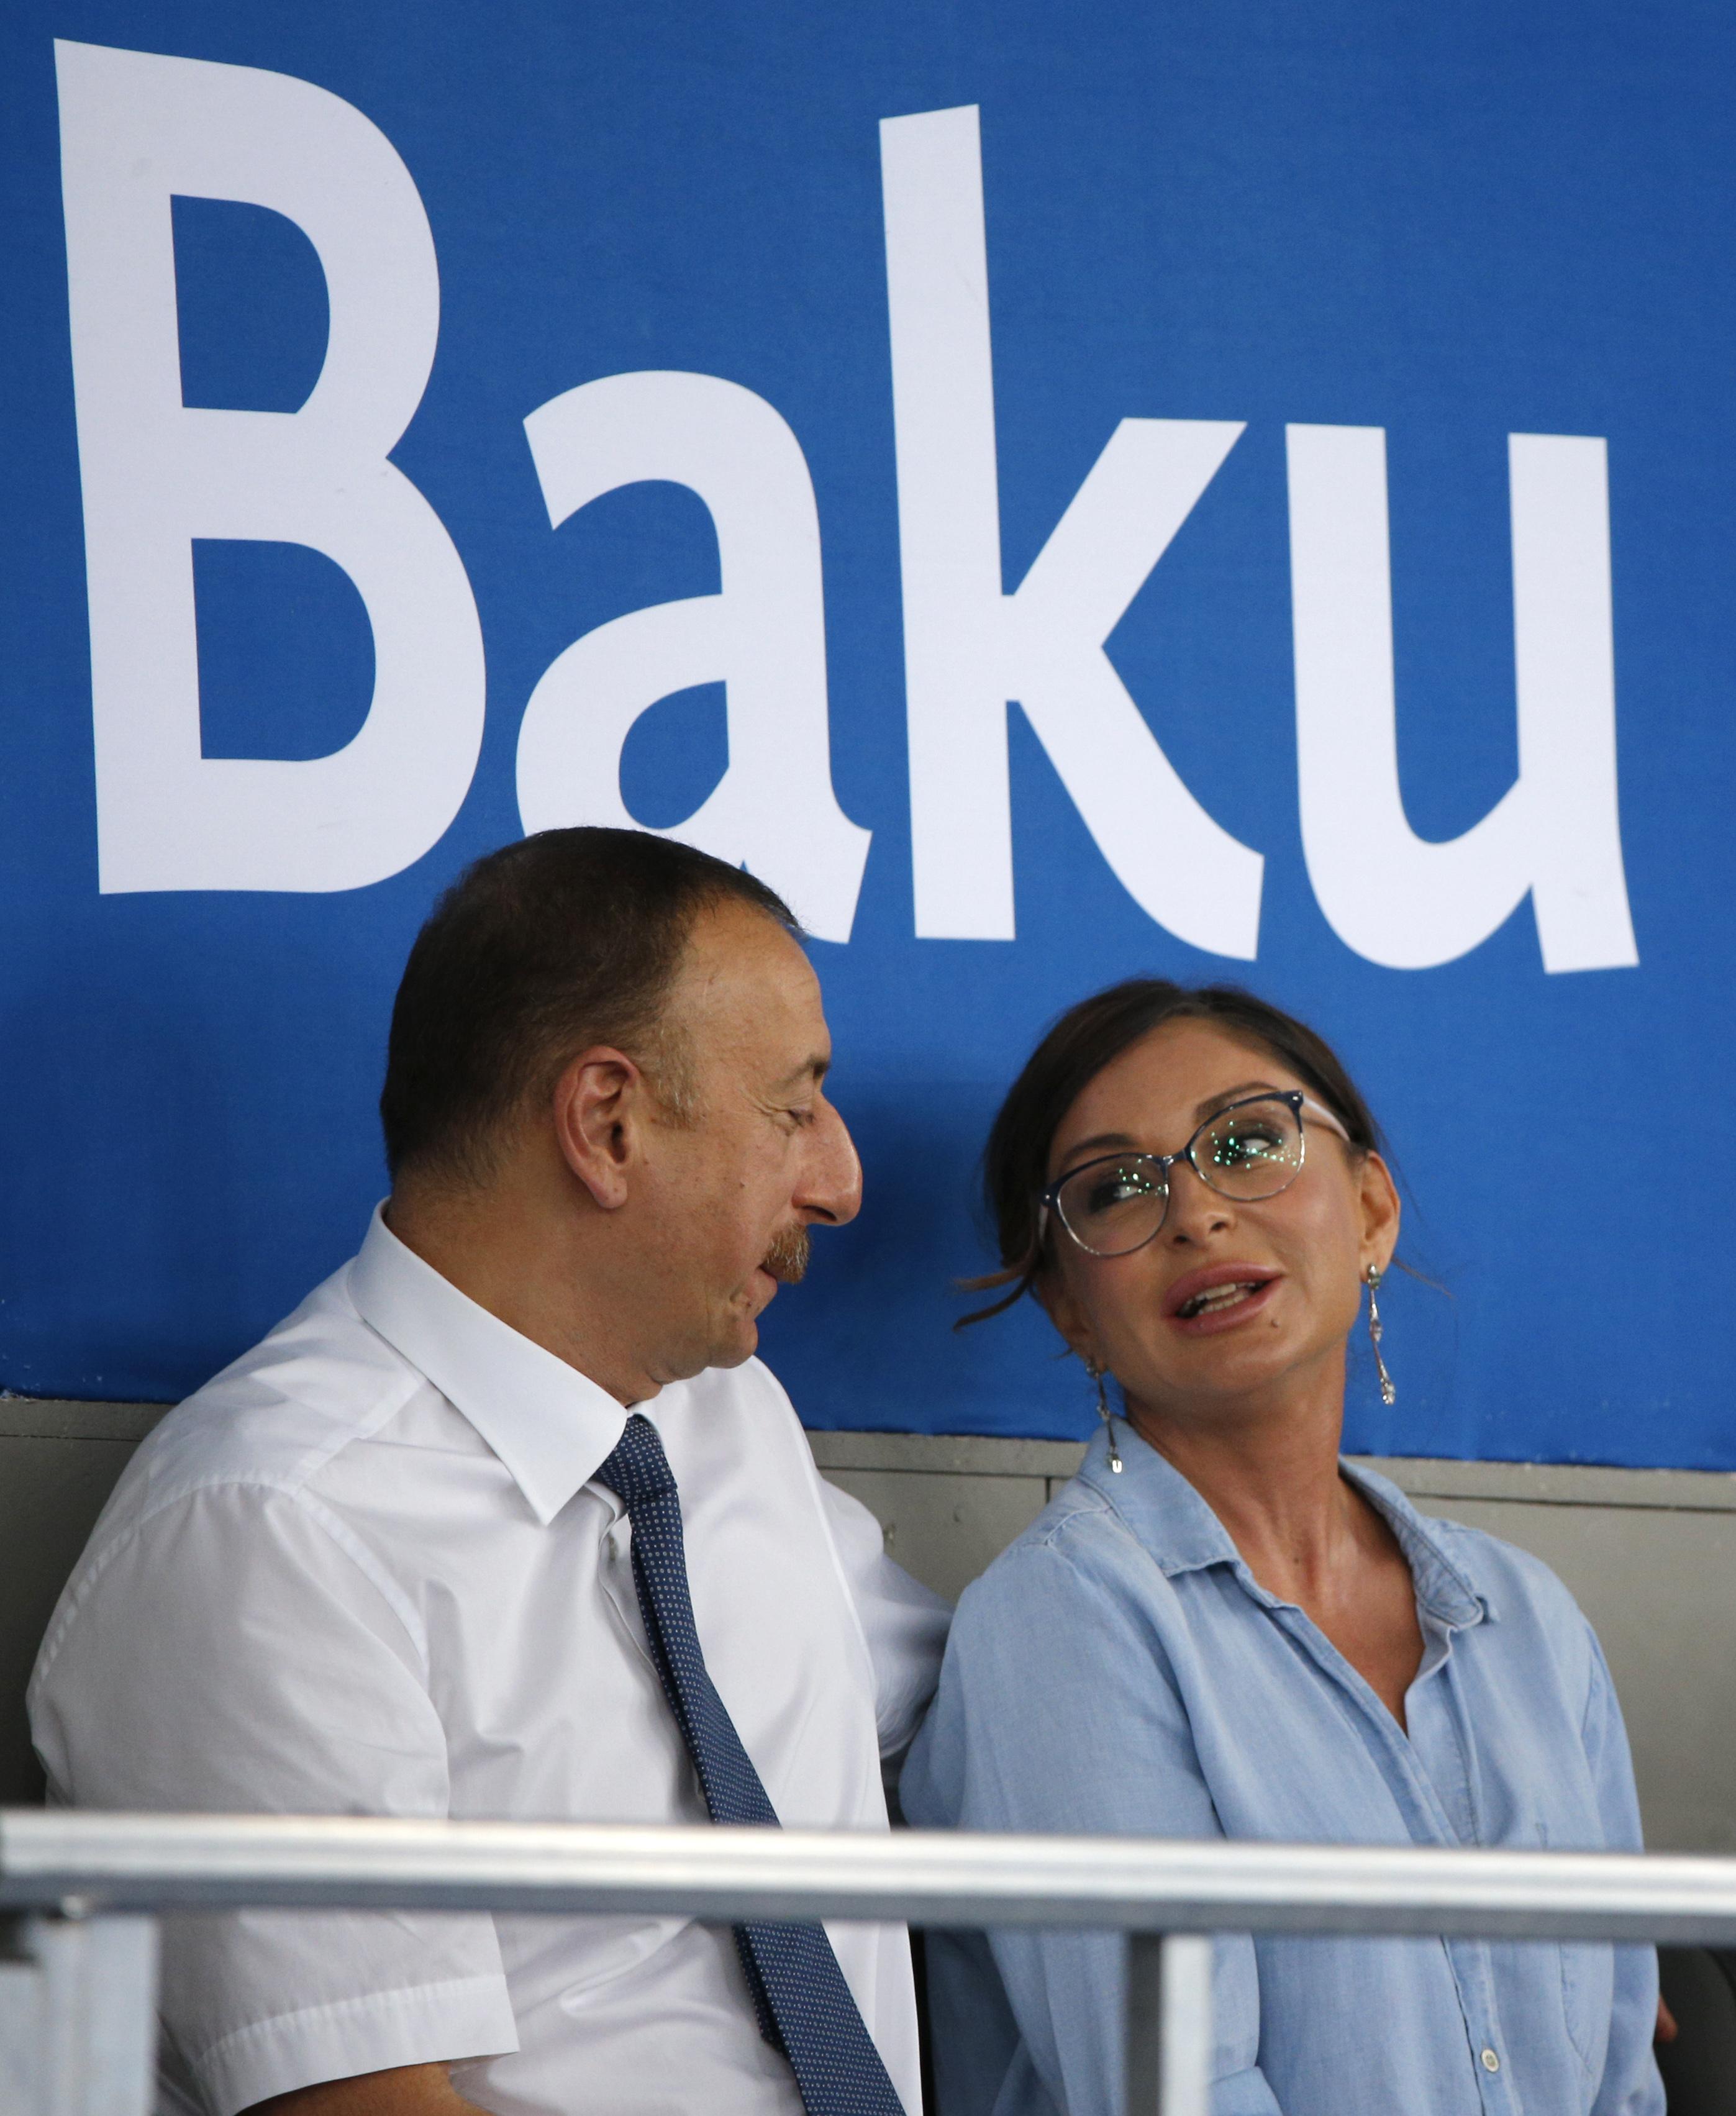 Azerbaijan President Ilham Aliyev and his wife Mehriban Aliyeva attend a taekwondo competition at the 2015 European Games in Baku, Azerbaijan, Thursday, June 18, 2015. (AP Photo/Dmitry Lovetsky)